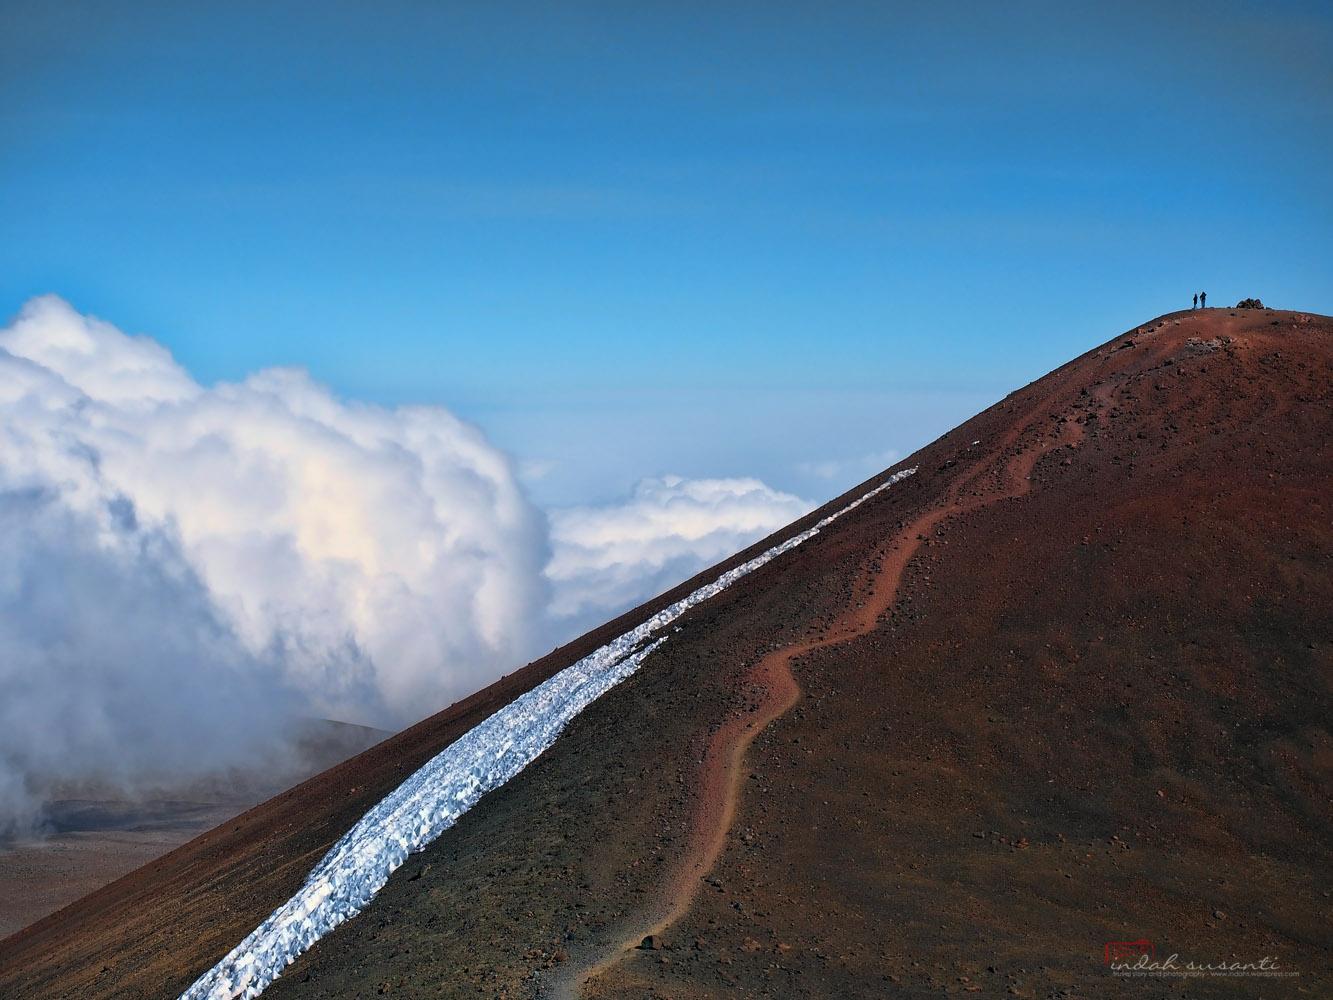 4 Wheel Drive Rental >> Imiloa, Saddle Road and Mauna Kea (Hawaii) – indahs: dive, travel & photography